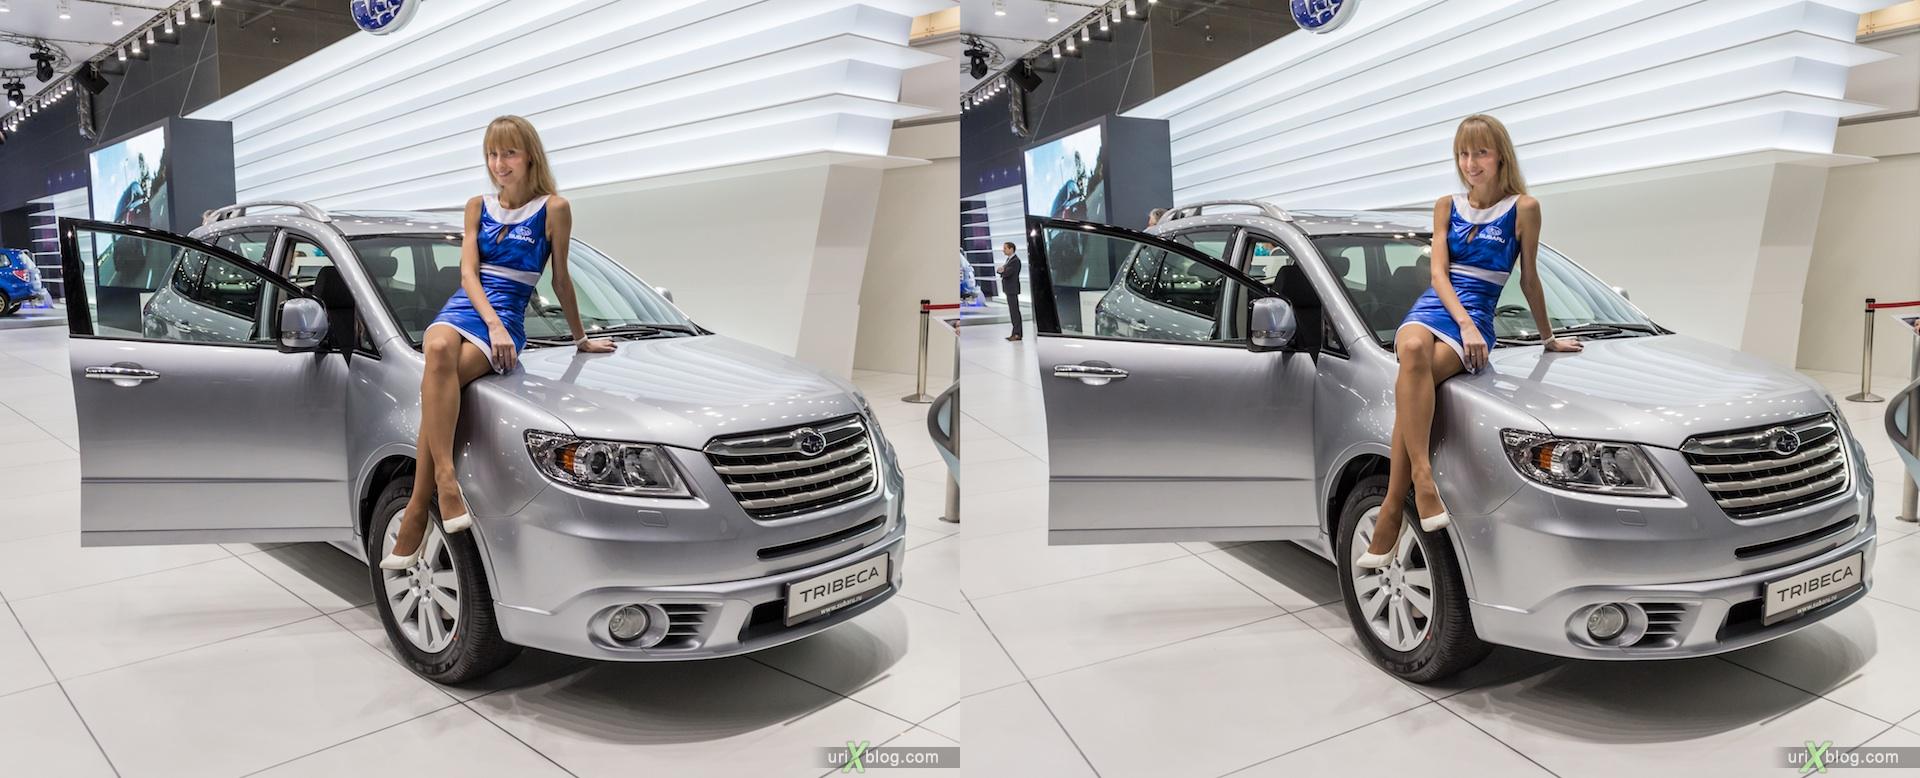 2012, Subaru Tribeca, девушка, модель, girl, model, Moscow International Automobile Salon, auto show, 3D, stereo pair, cross-eyed, crossview